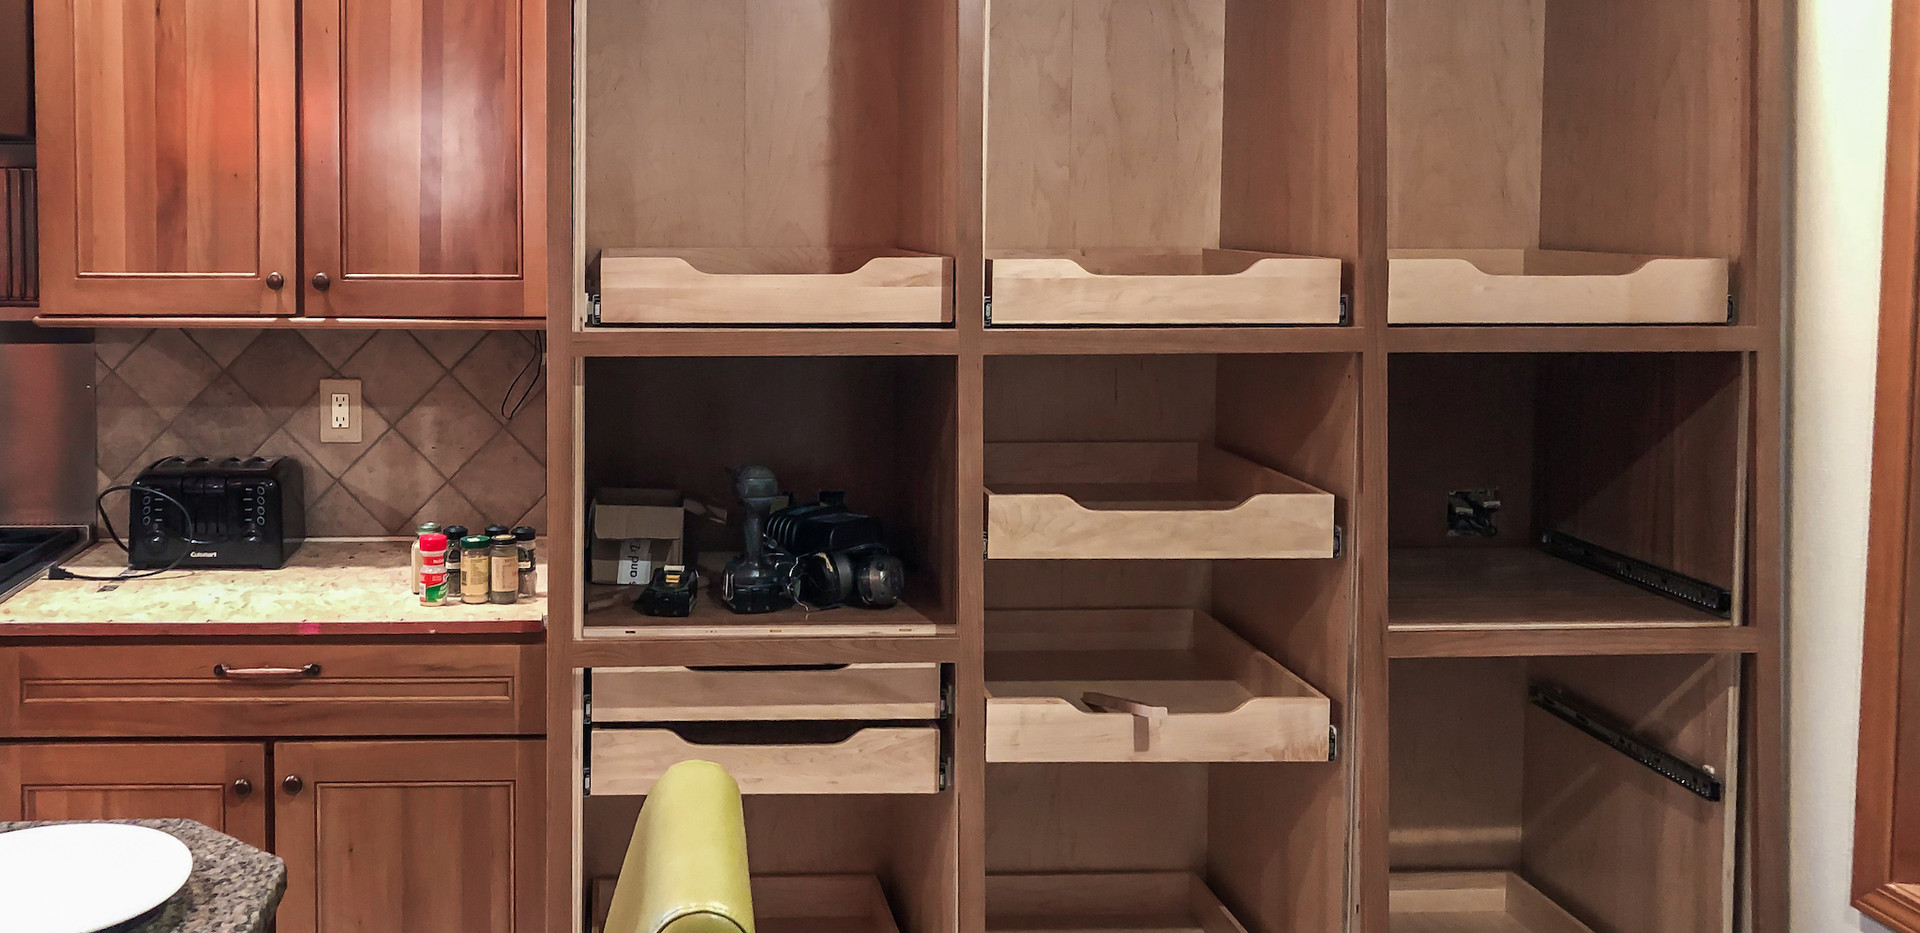 Kitchen Cabinet Boxes Installed.jpg